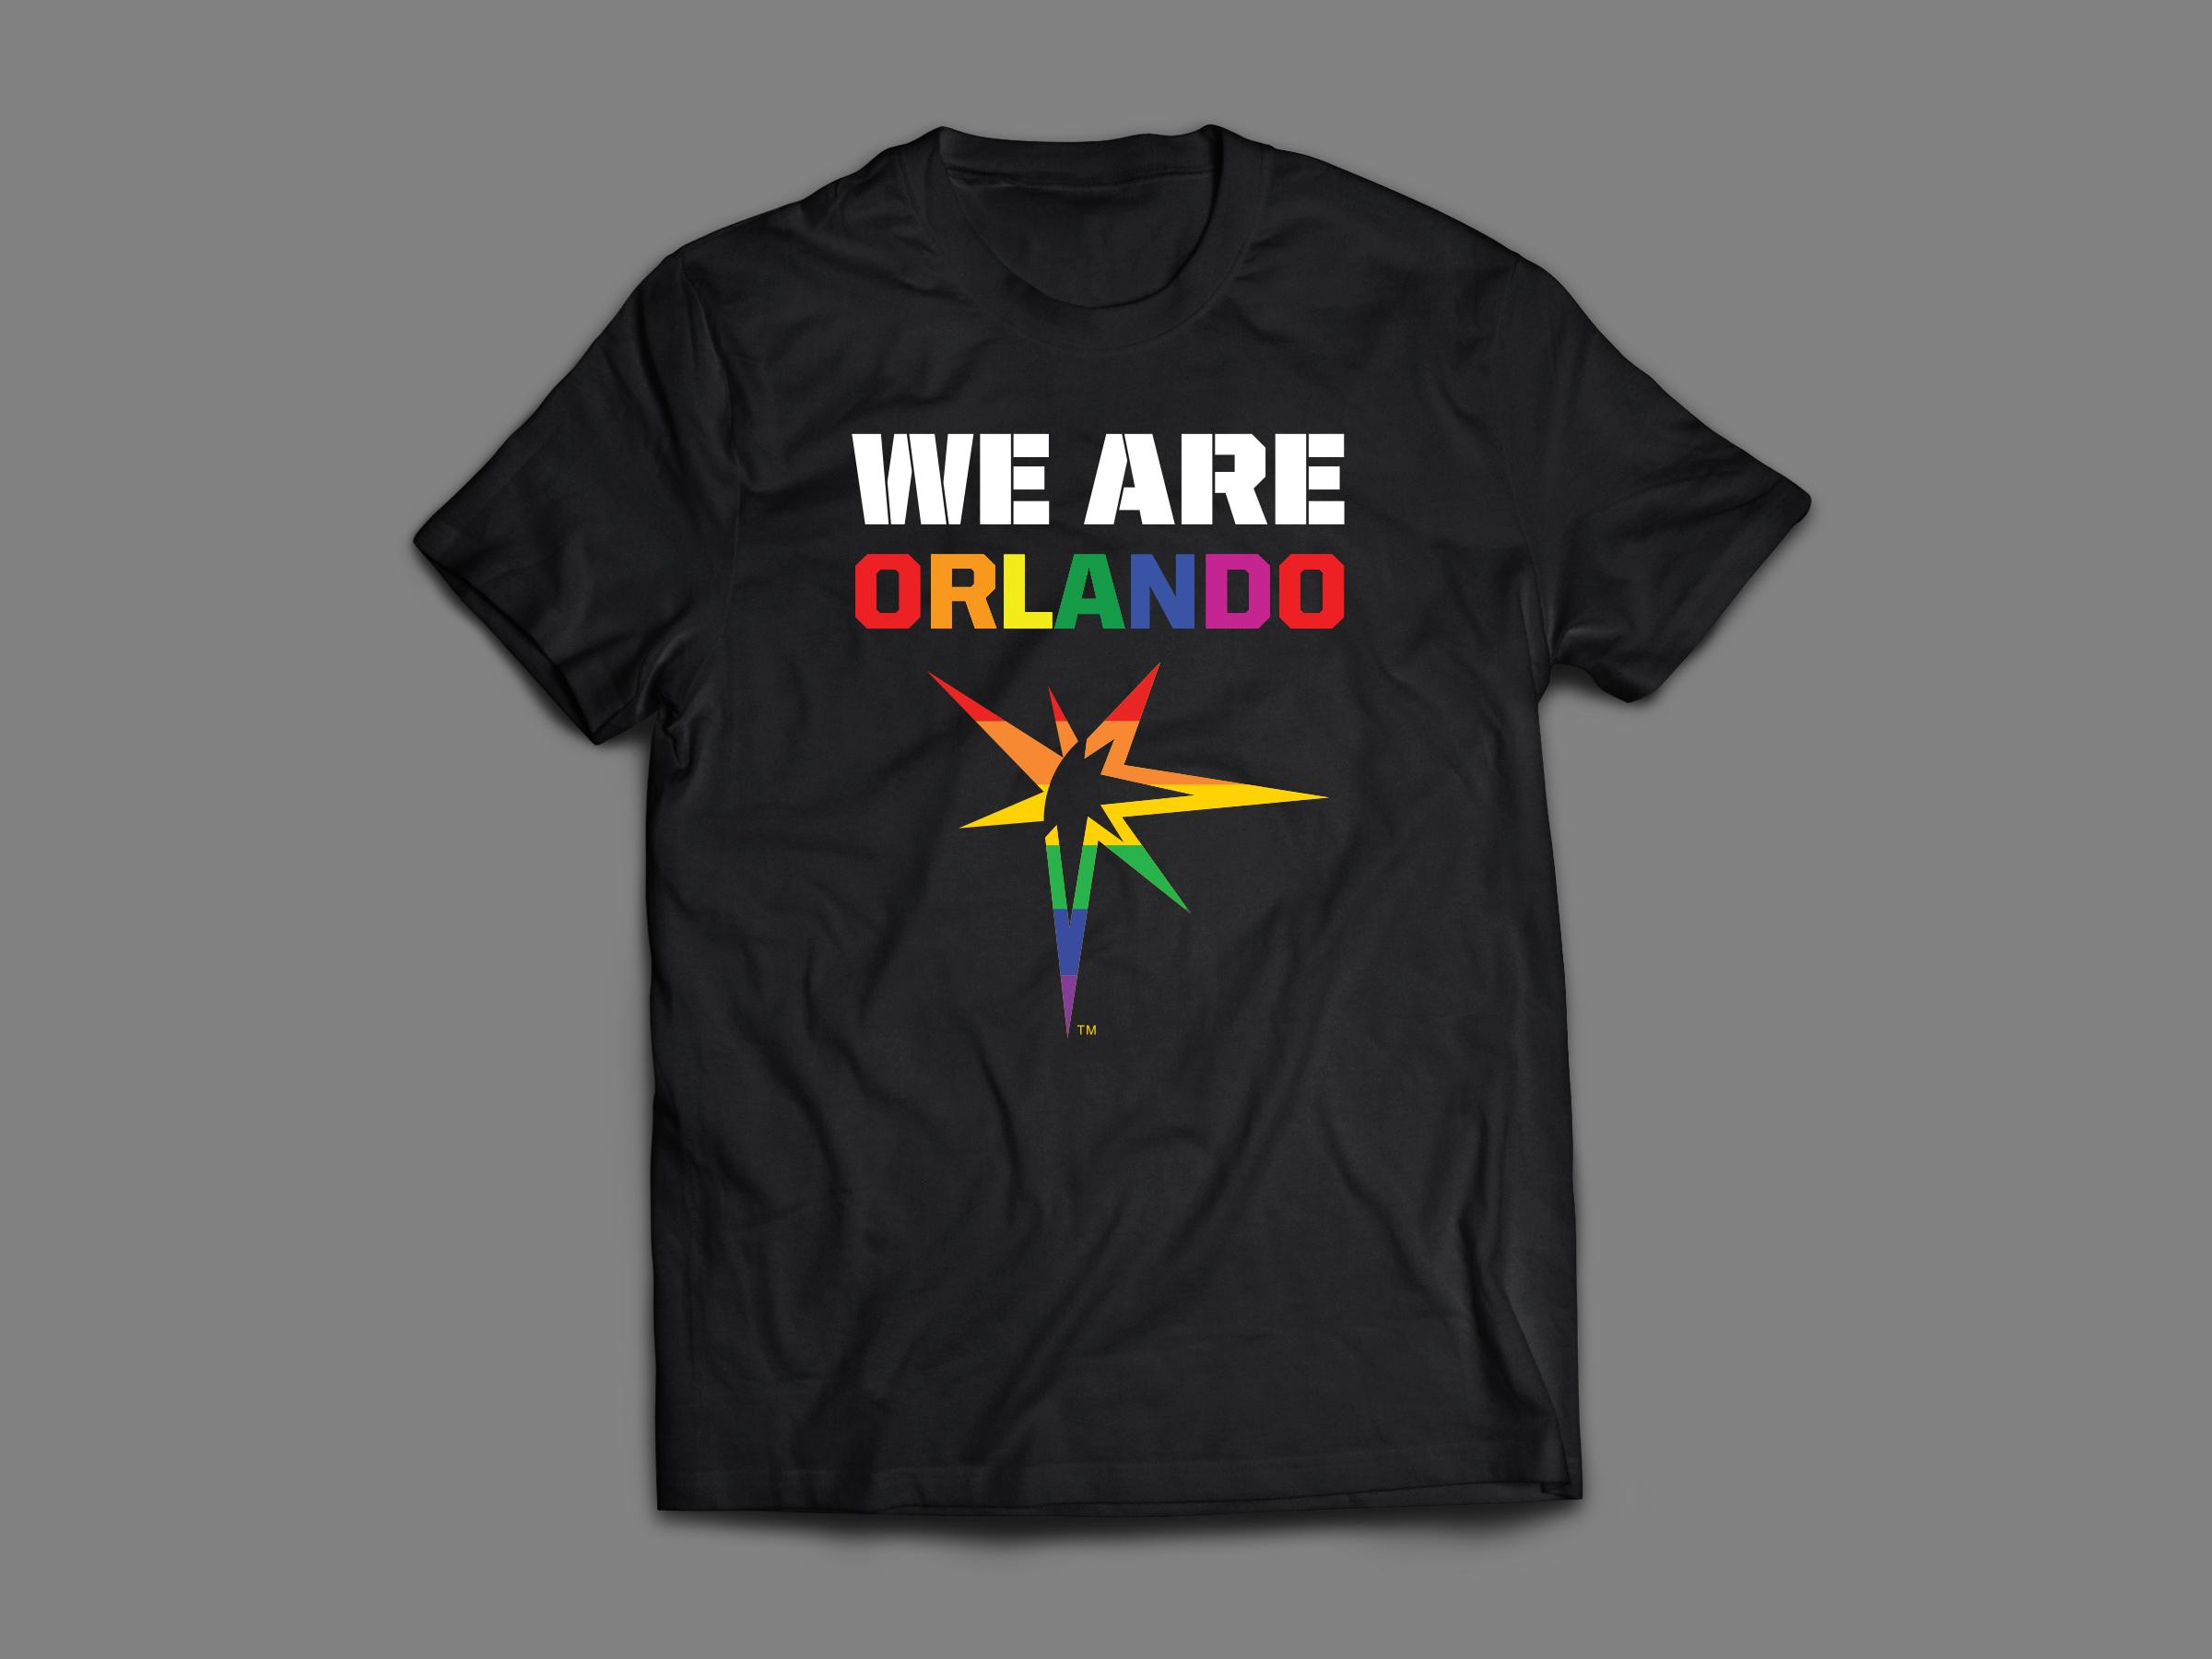 Tampa Bay Rays 39 Pride Night Becomes Pulse Orlando